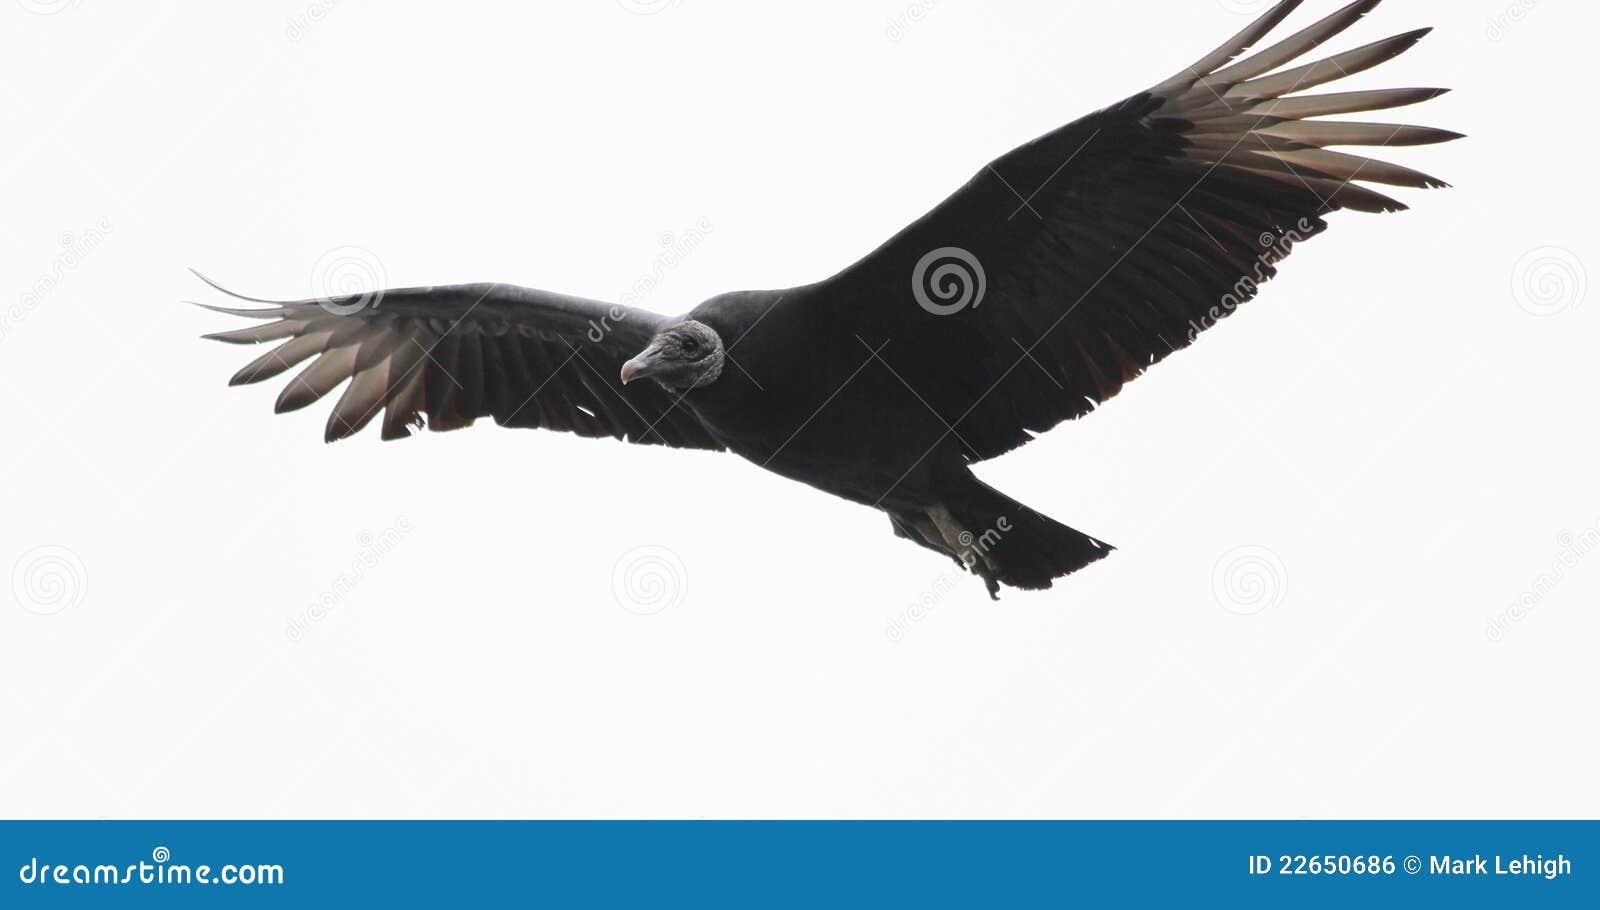 Download Soaring buzzard stock photo. Image of bill, head, evil - 22650686